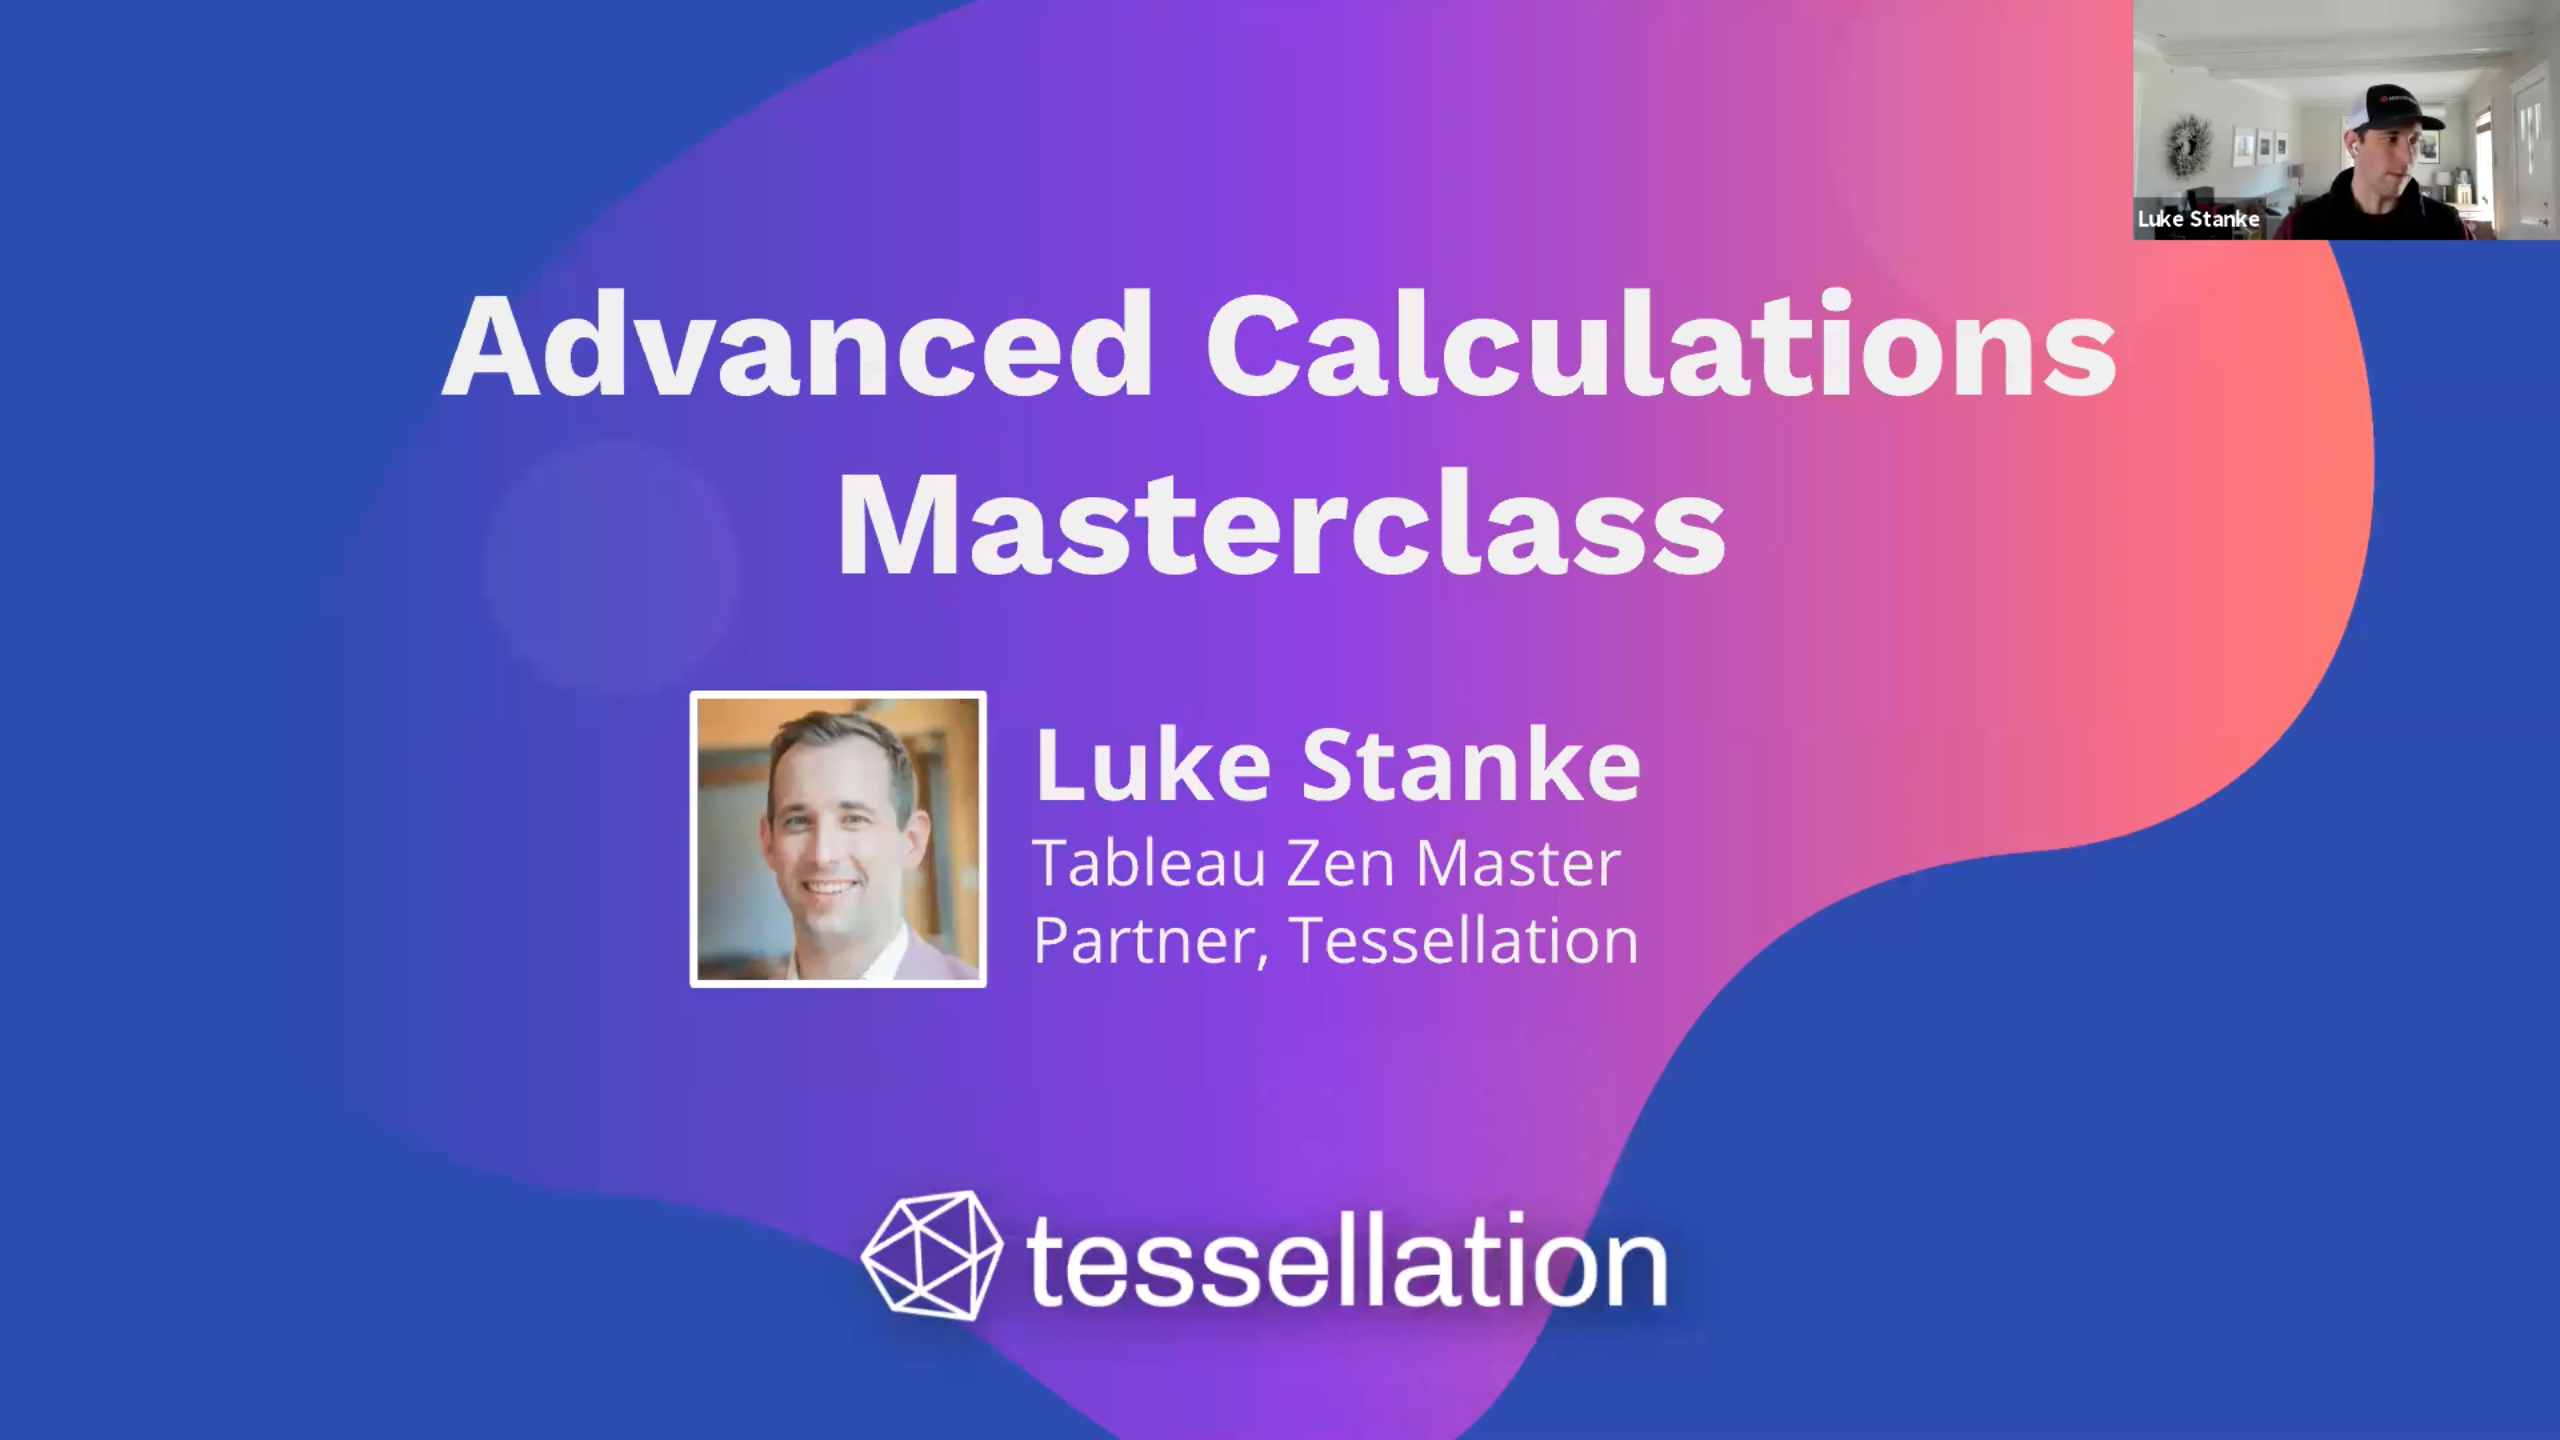 Thought Leader Masterclass Webinar with Luke Stanke